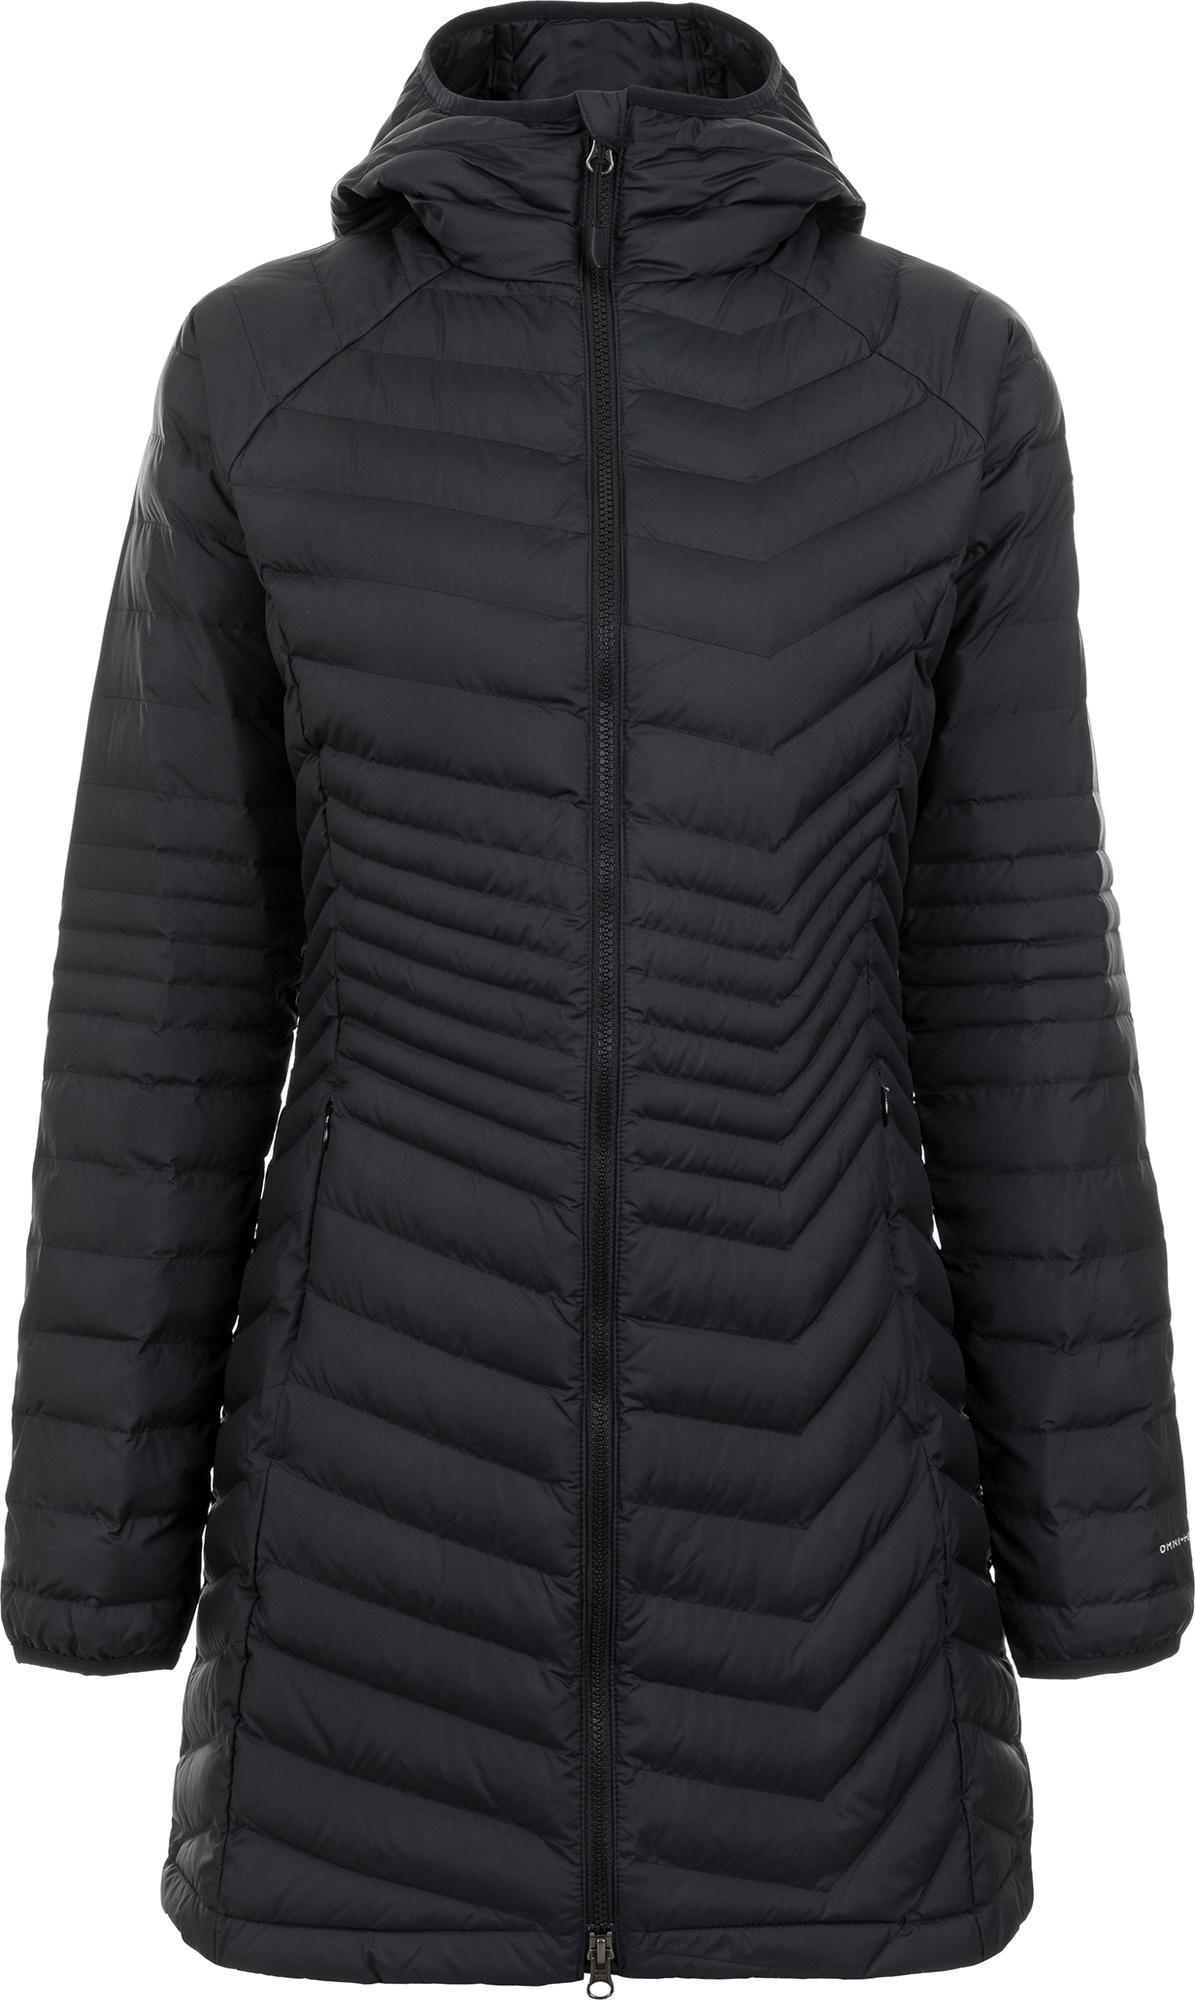 Columbia Куртка утепленная женская Columbia Powder Lite, размер 44